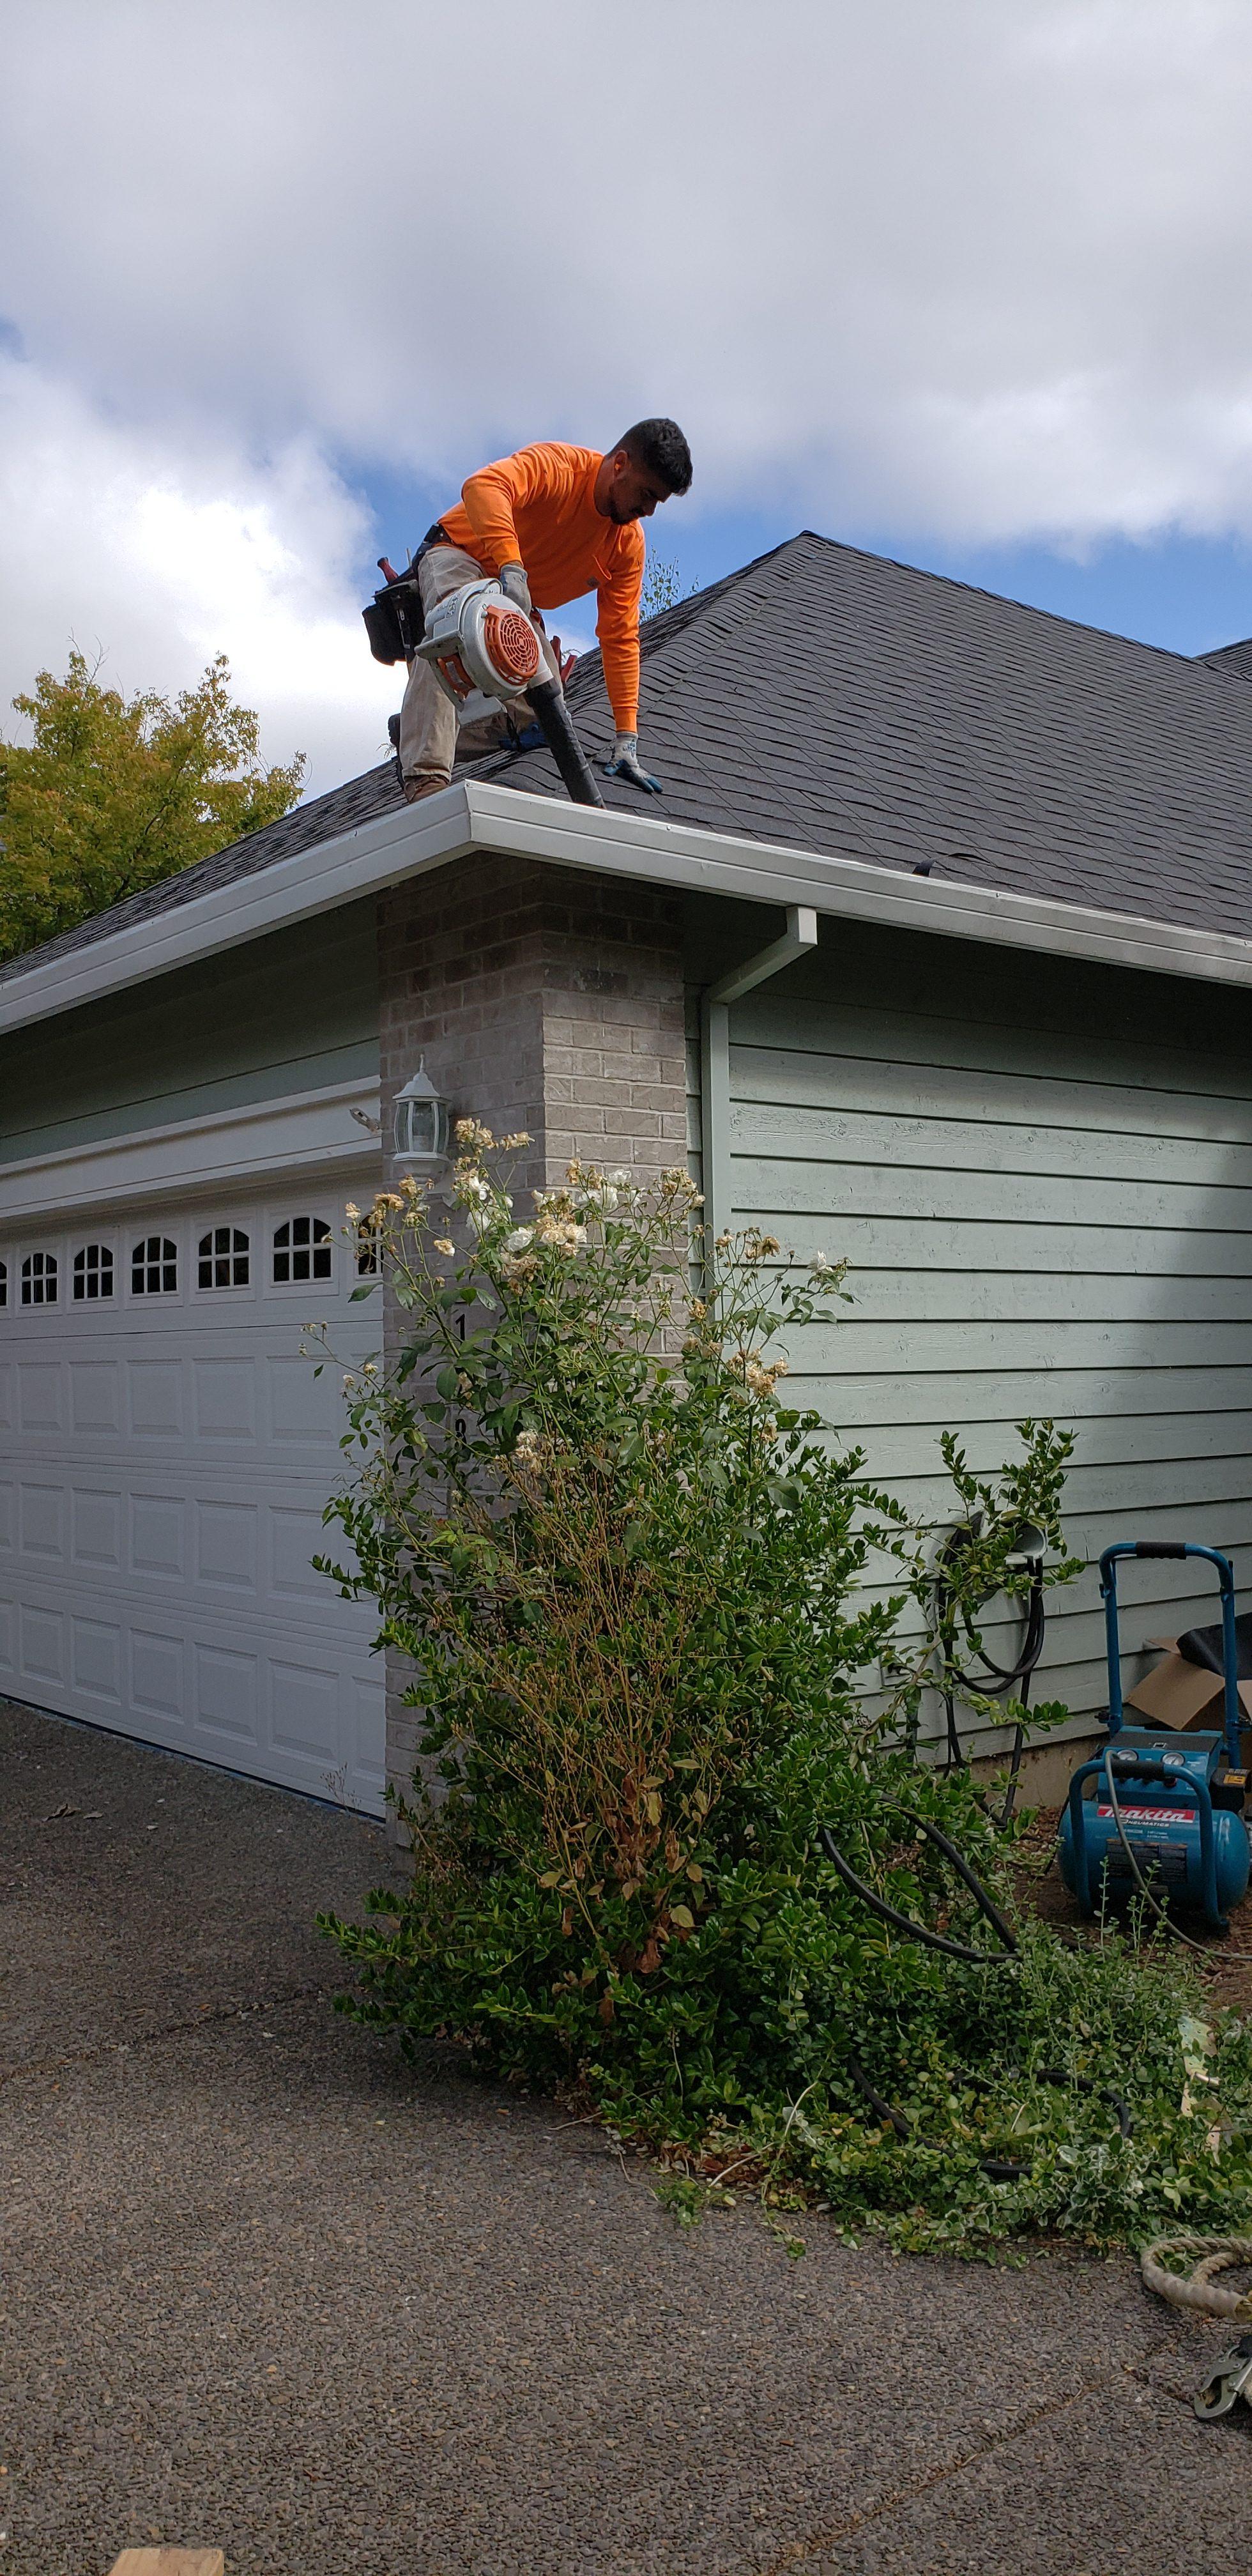 Tonys Roofing LLC image 2